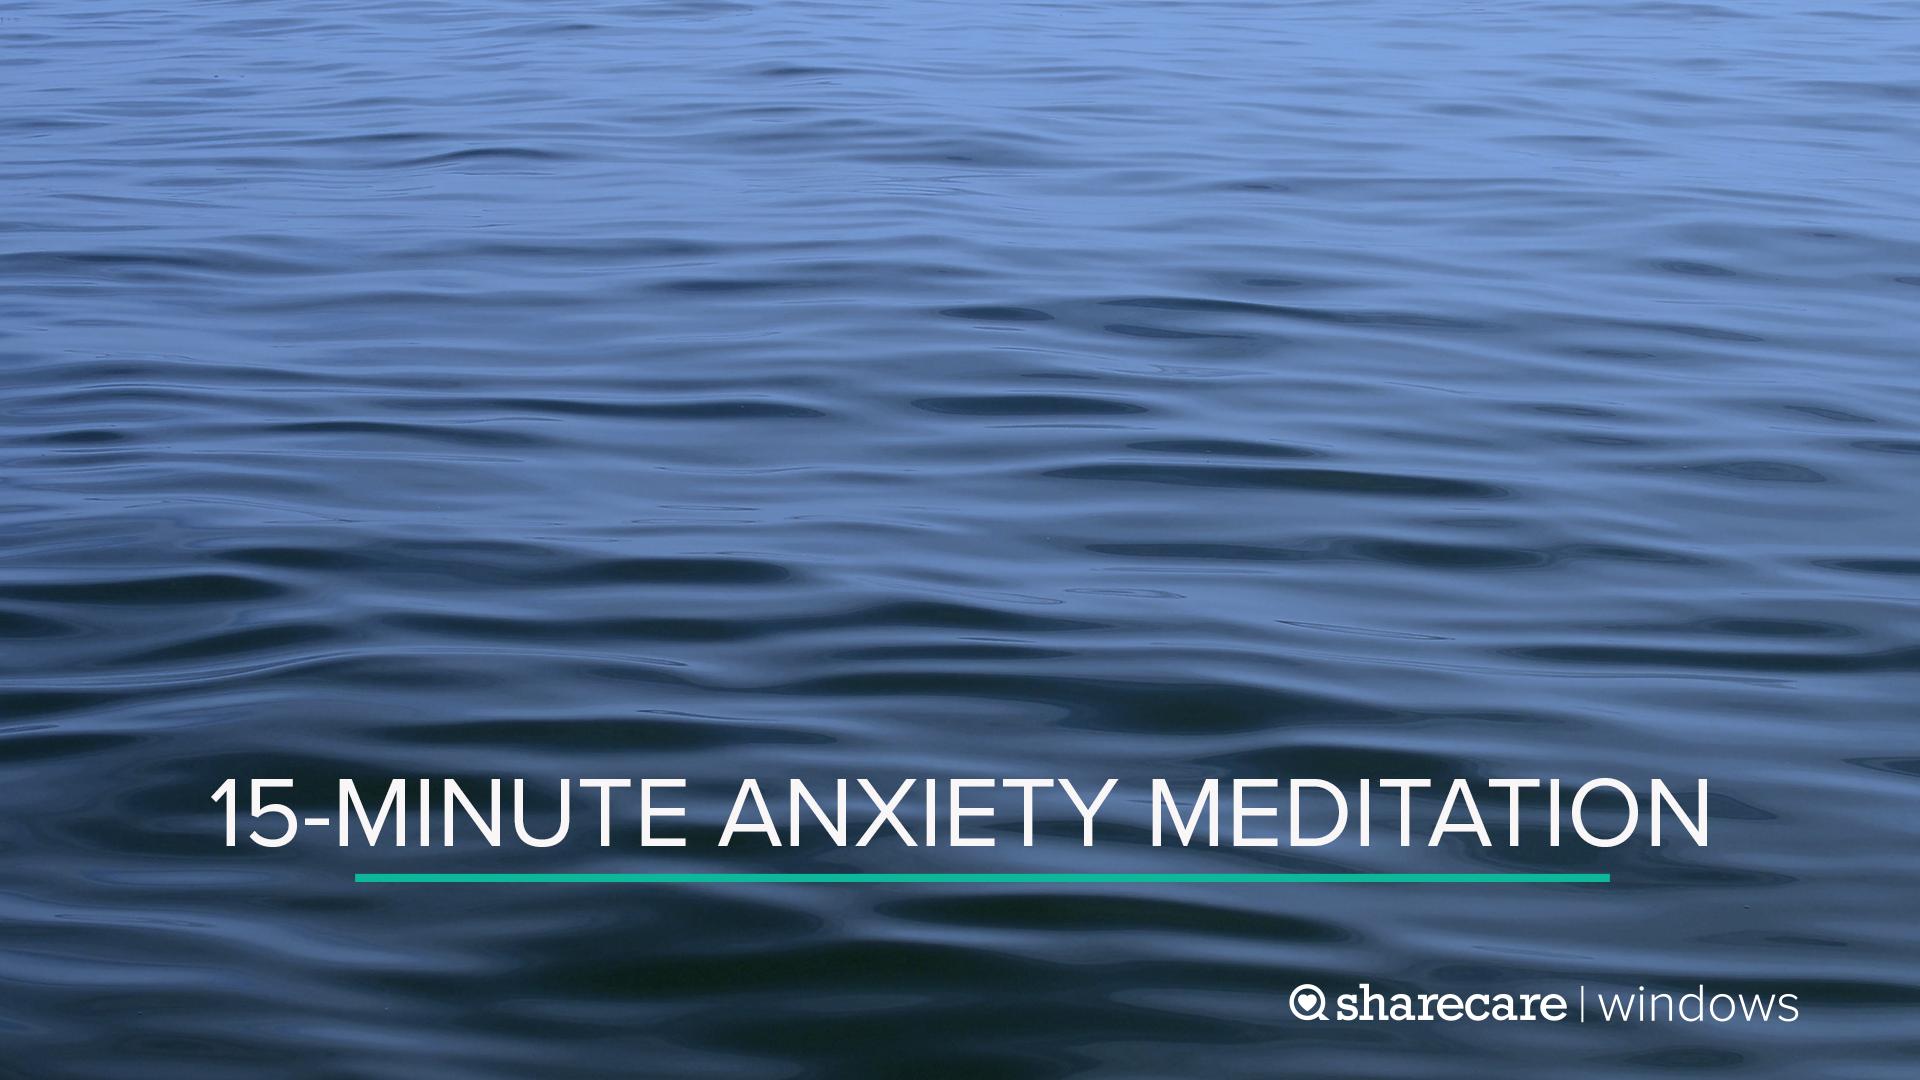 15-Minute Anxiety Meditation